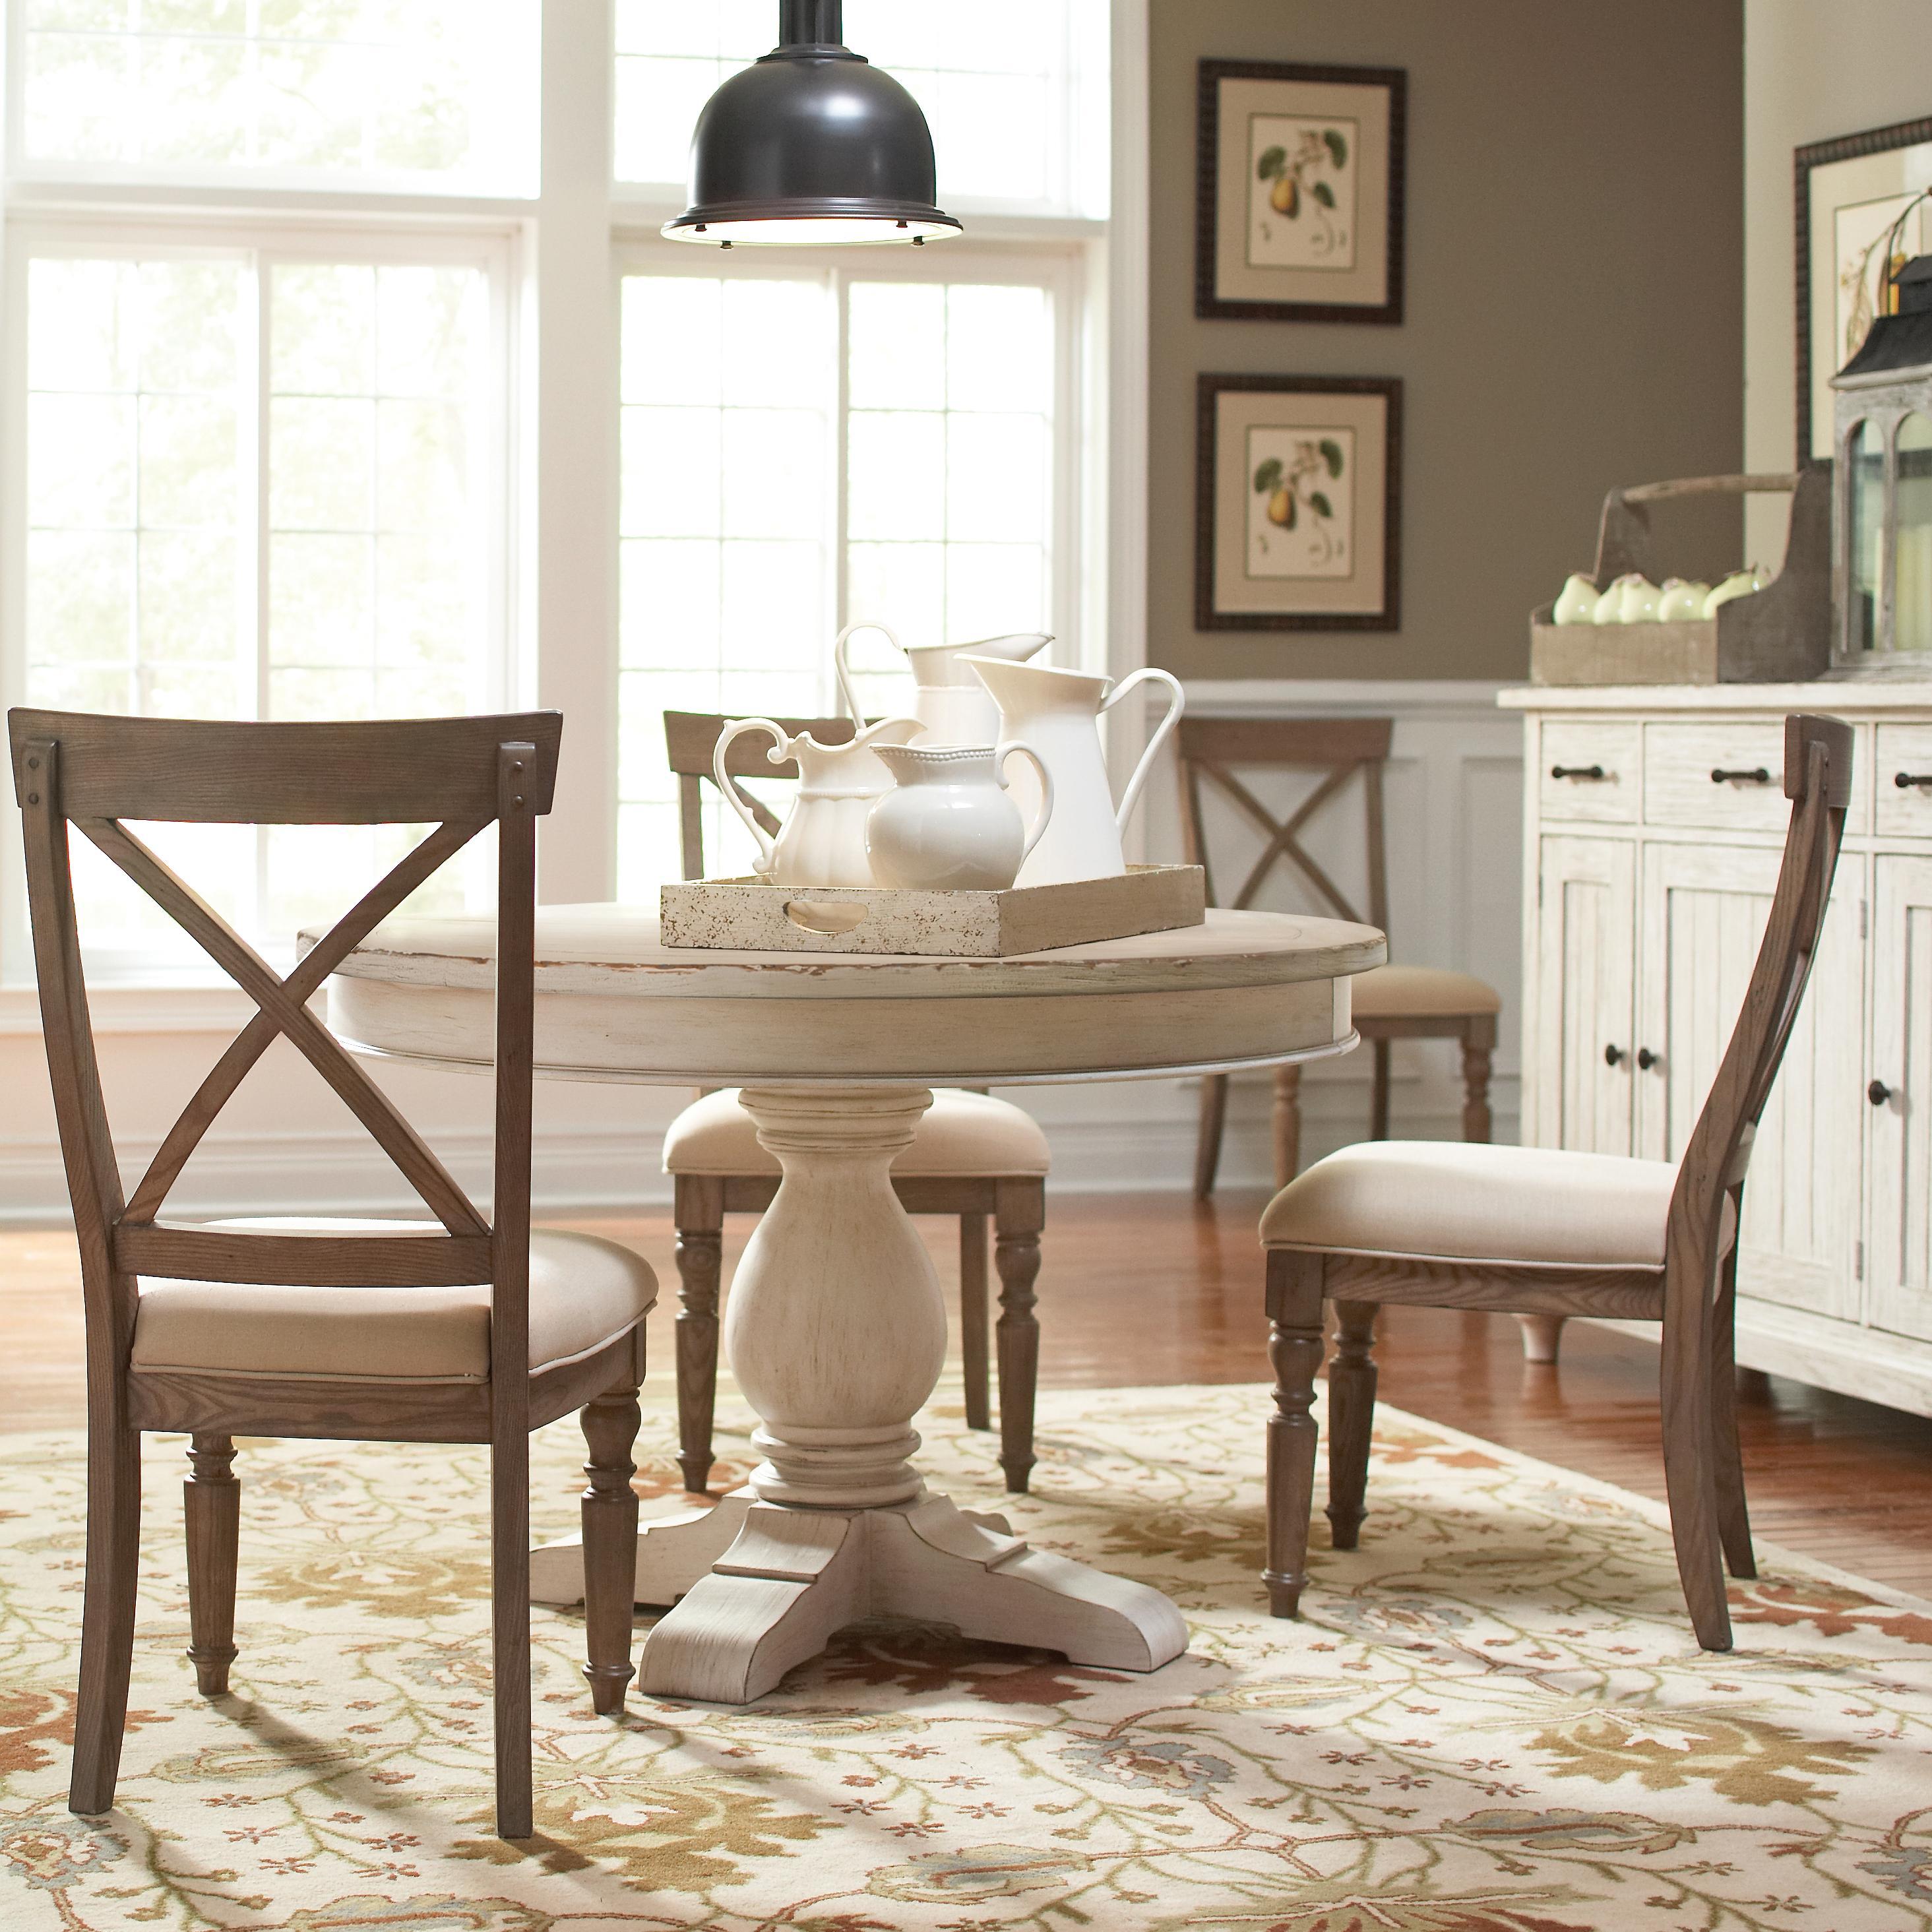 4 Piece Round Pedestal Dining Set by Riverside Furniture